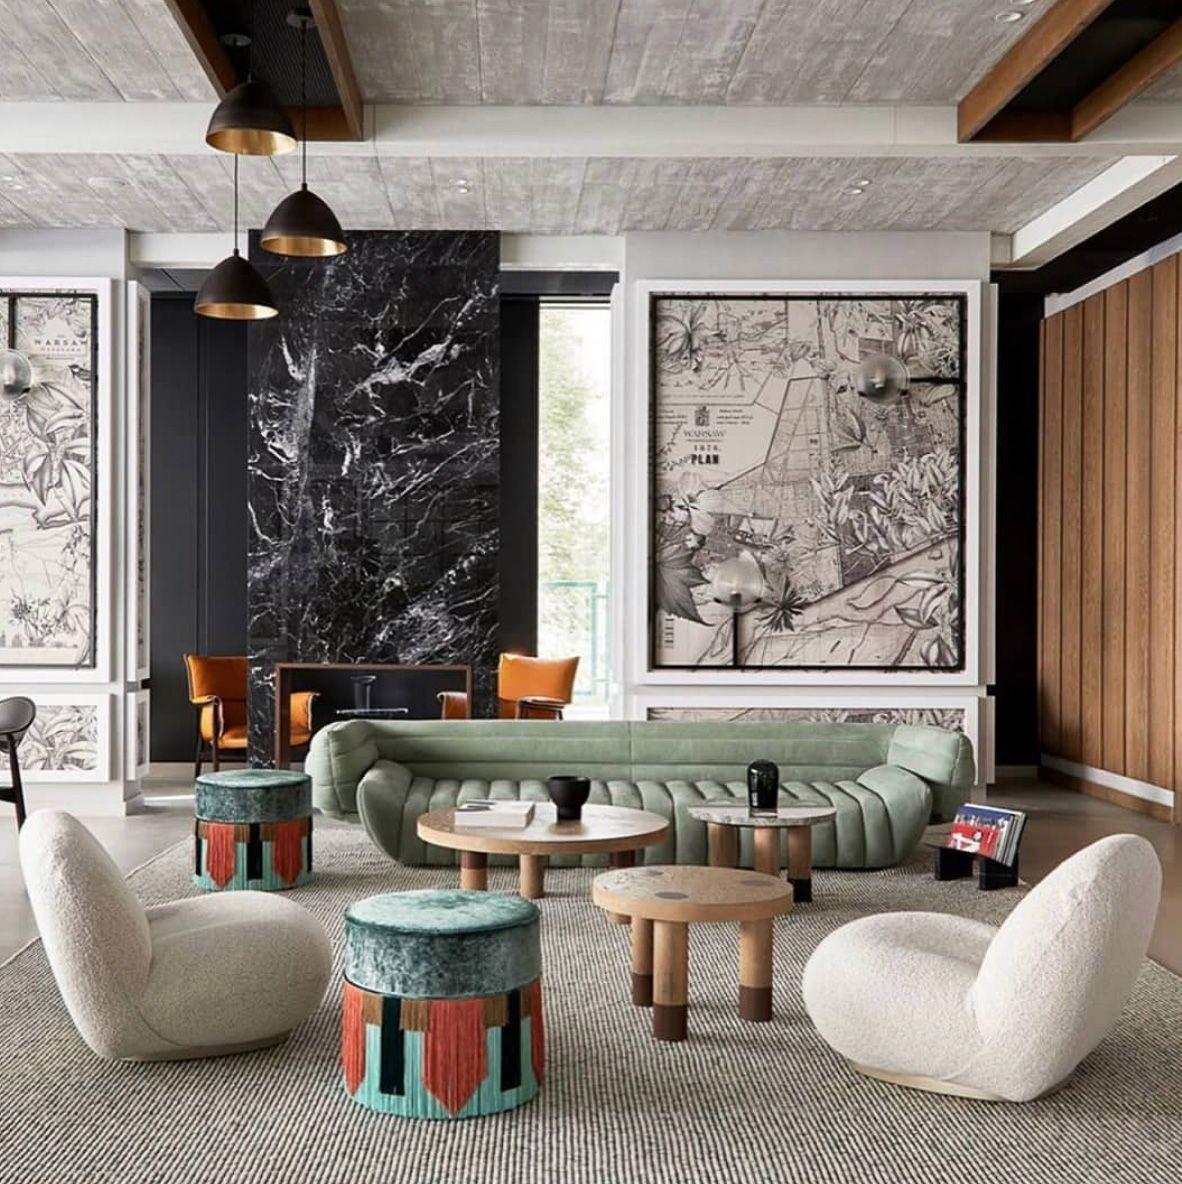 Mid Century Modern French Abitare Design Blog In 2020 Interior Design House Interior Contemporary Furniture Design